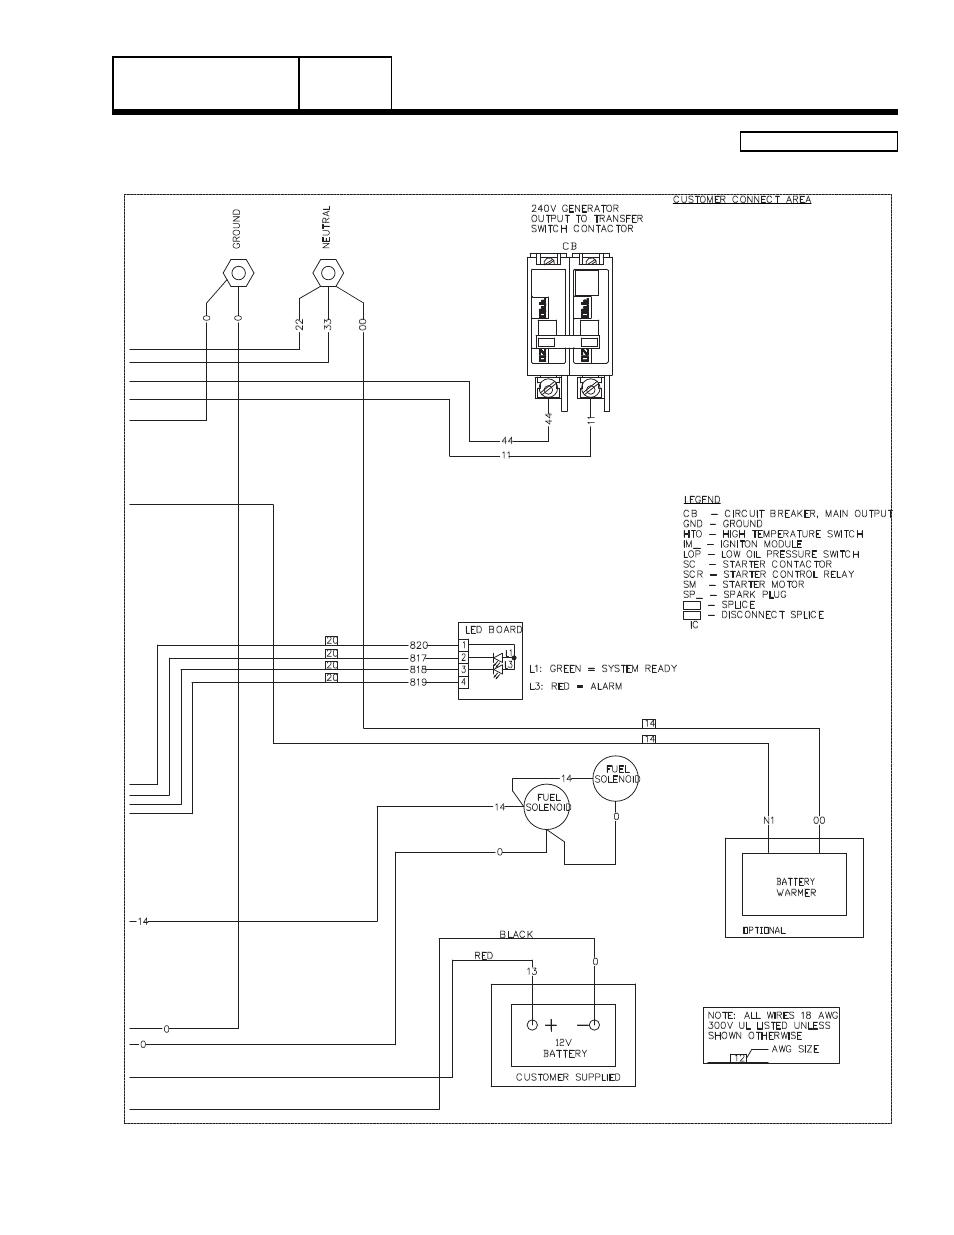 Generac Guardian 45kw Engine Control Module Wiring Diagram